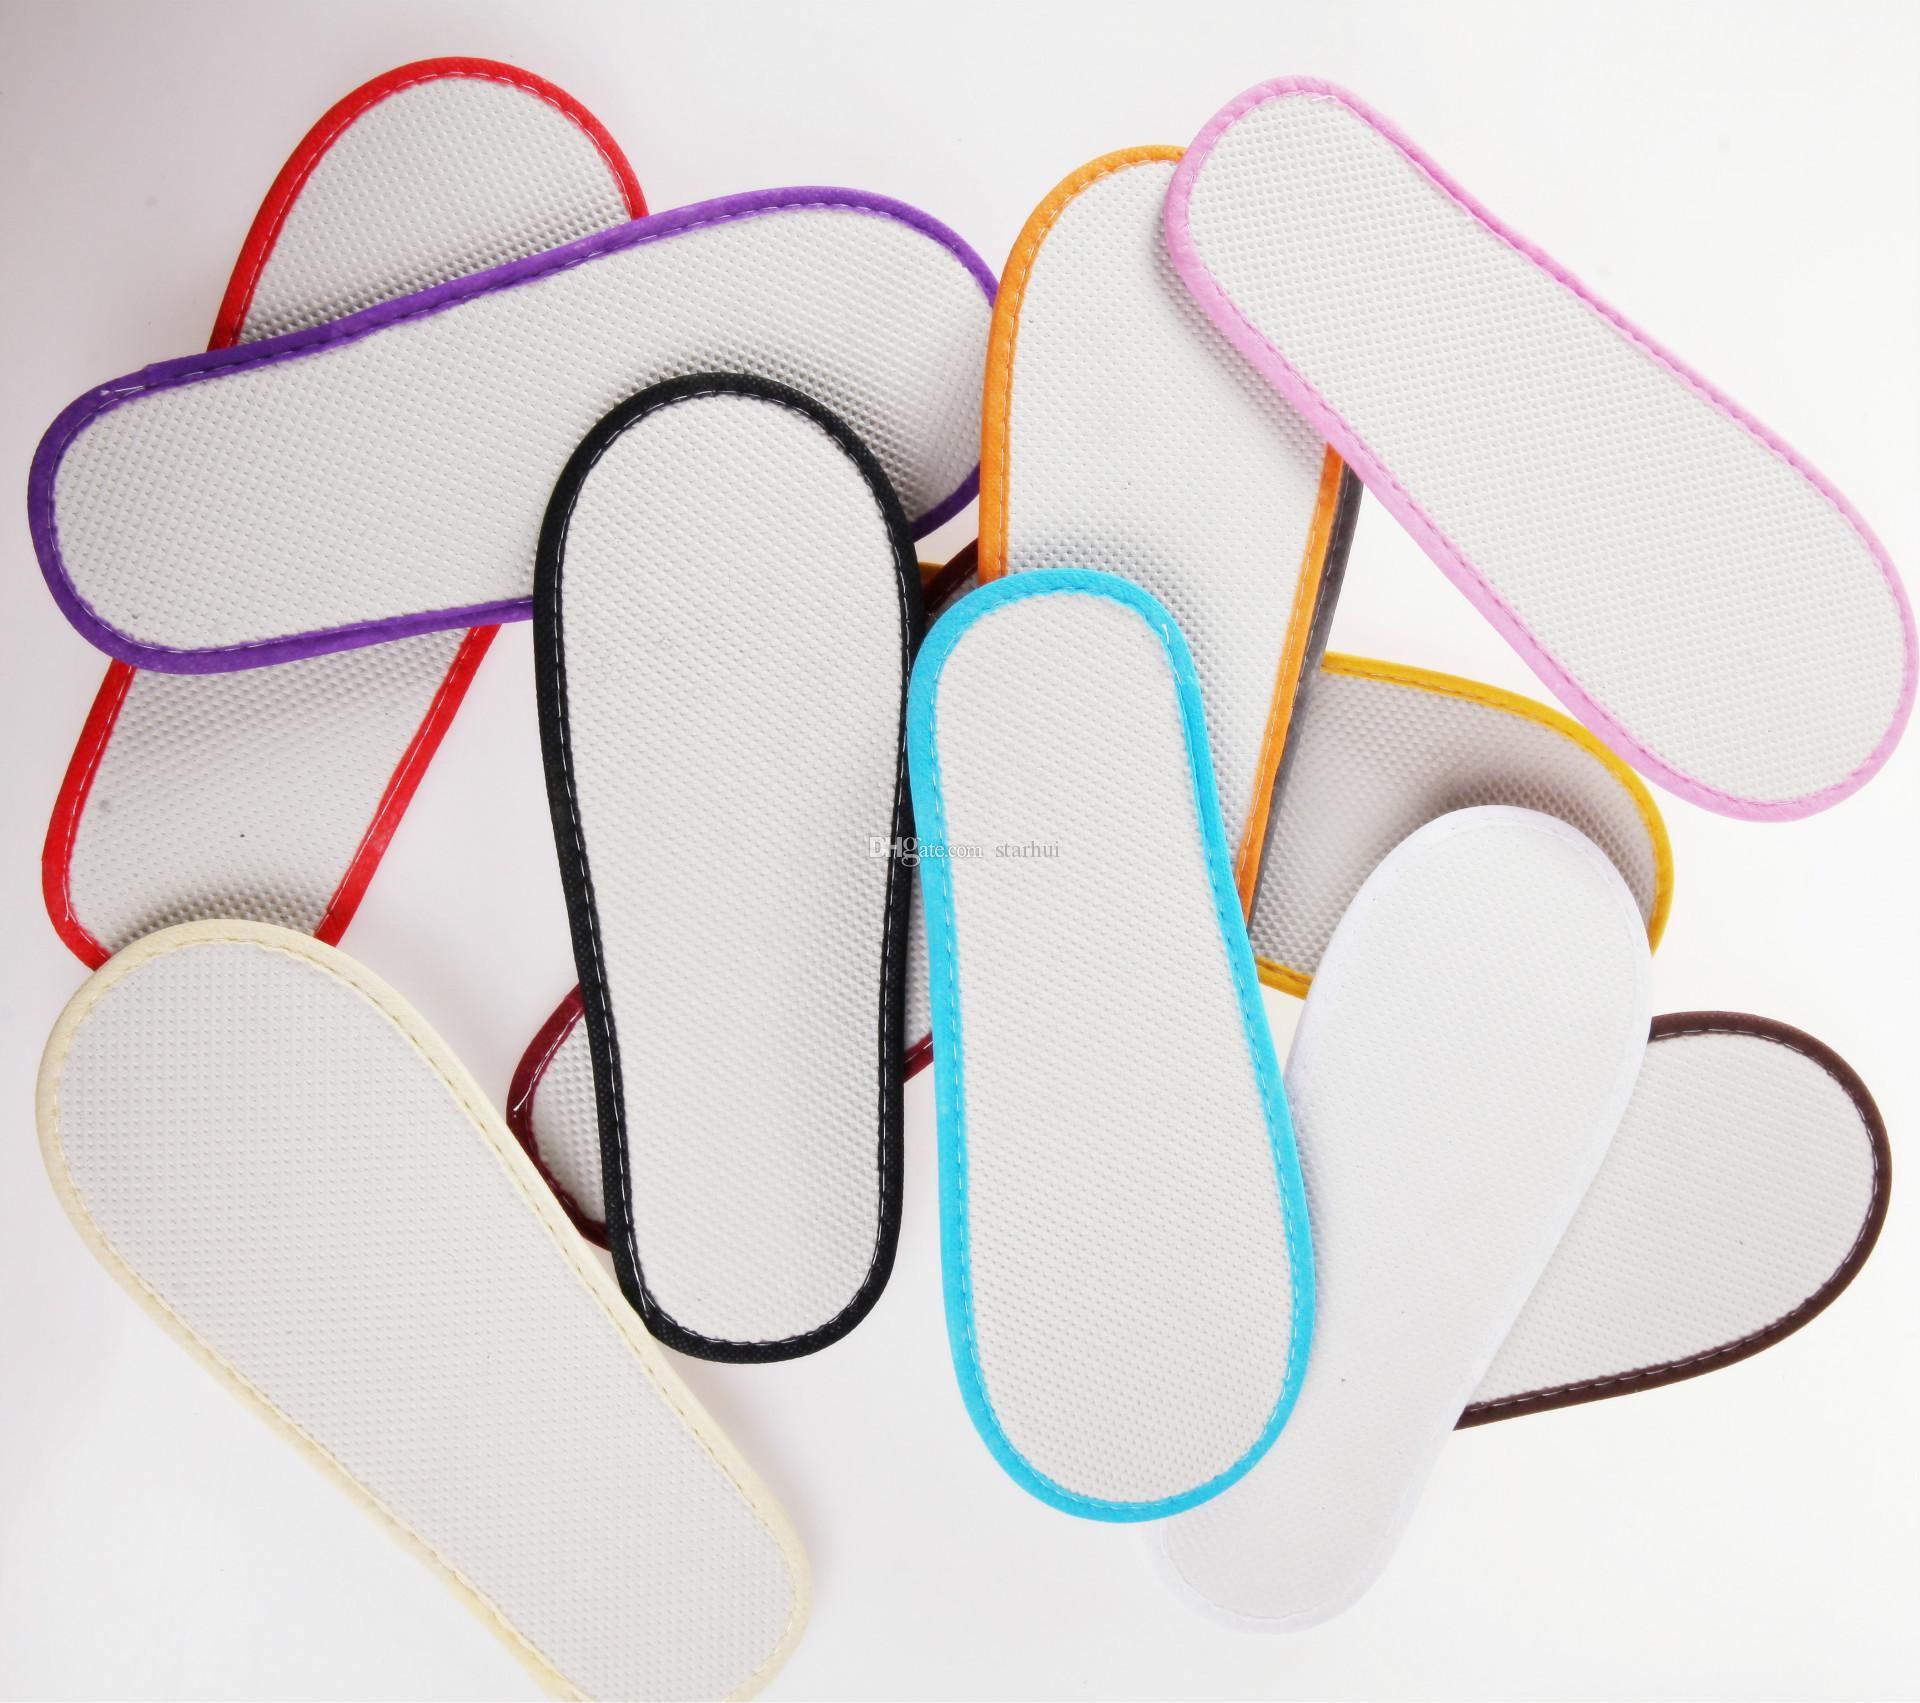 Bath Disposable Slippers Hotel Towelling Slippers EVA Slipper Men Women Flip Flop White Multi color Indoor Cheap Slipper Free DHL WX9-441